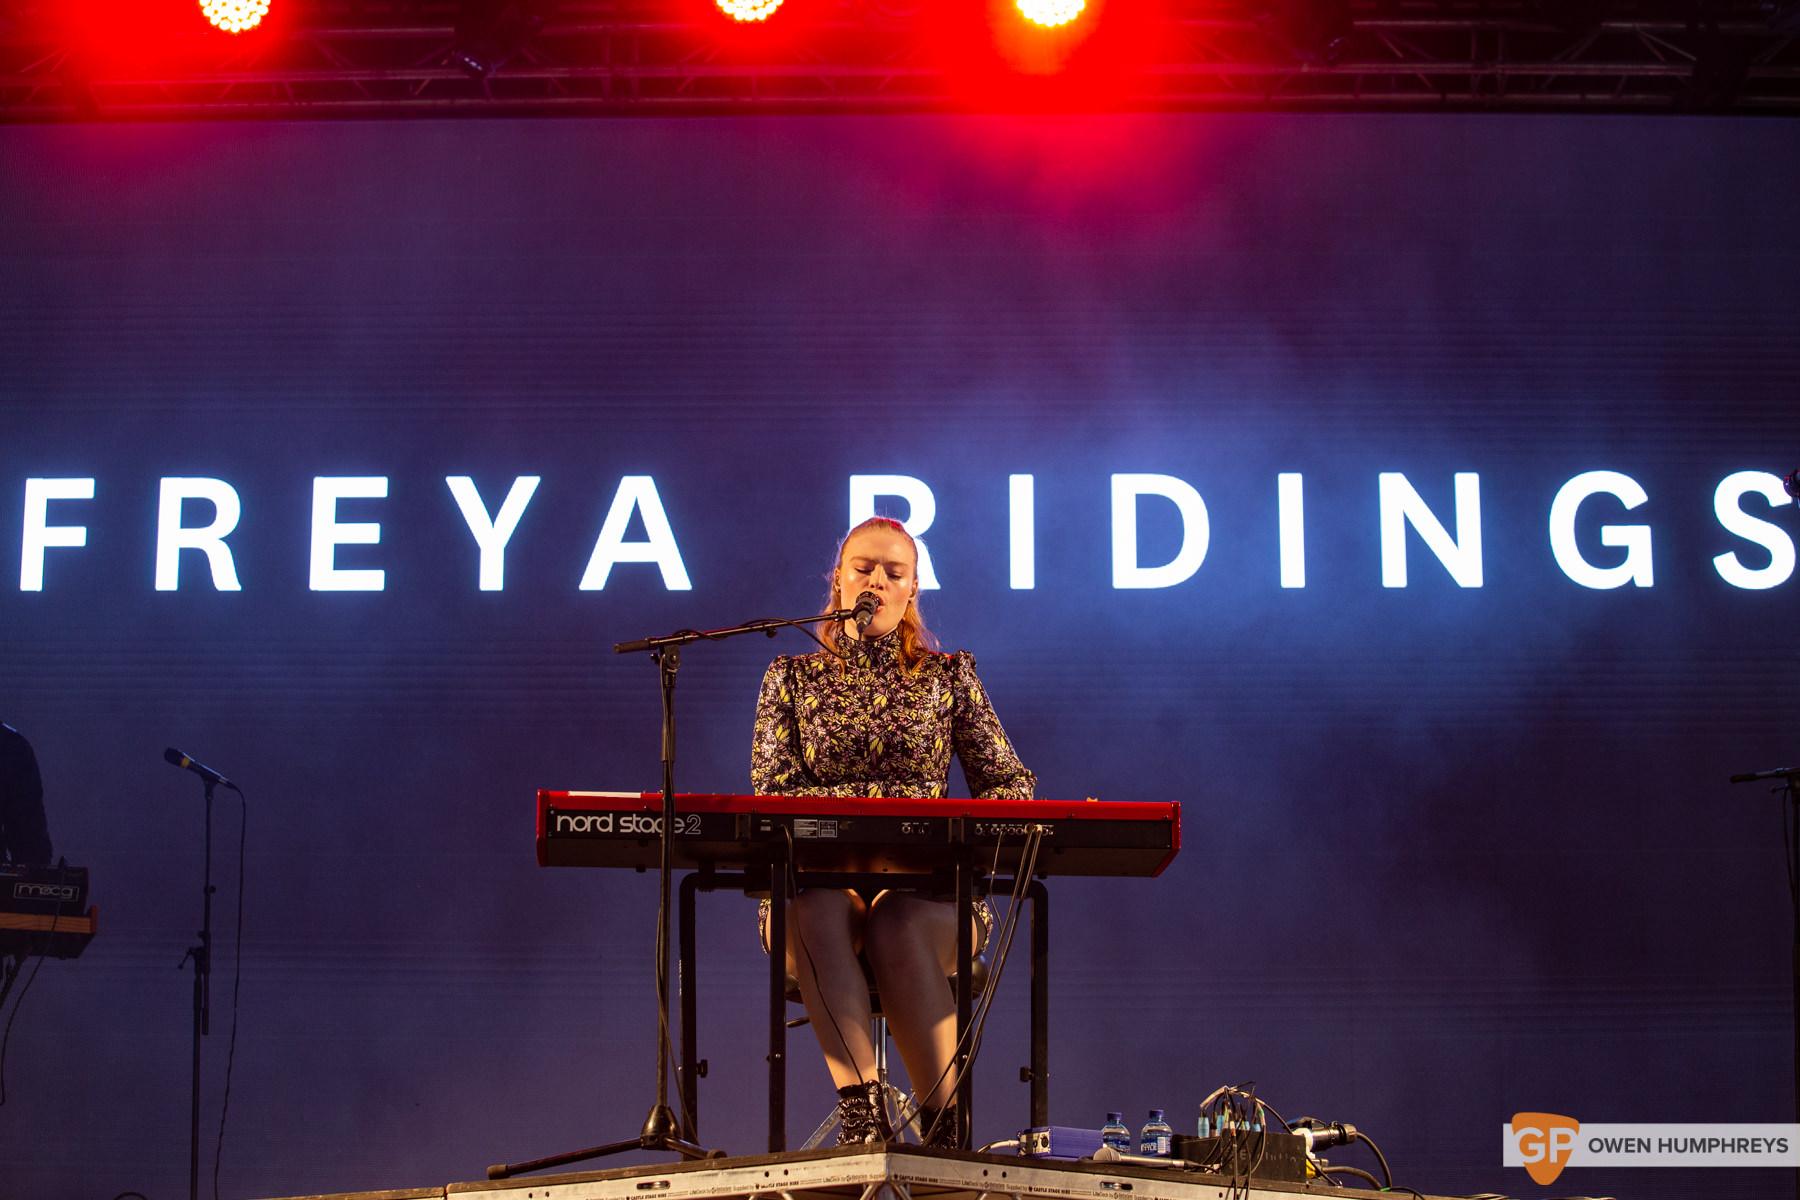 Freya Ridings at Electric Picnic 2019. Photo by Owen Humphreys. www.owen.ie